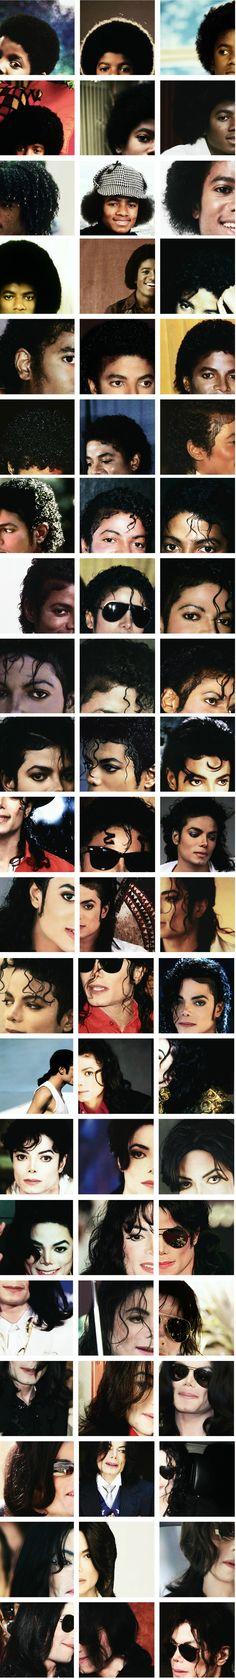 Michael Jackson's hair appreciation